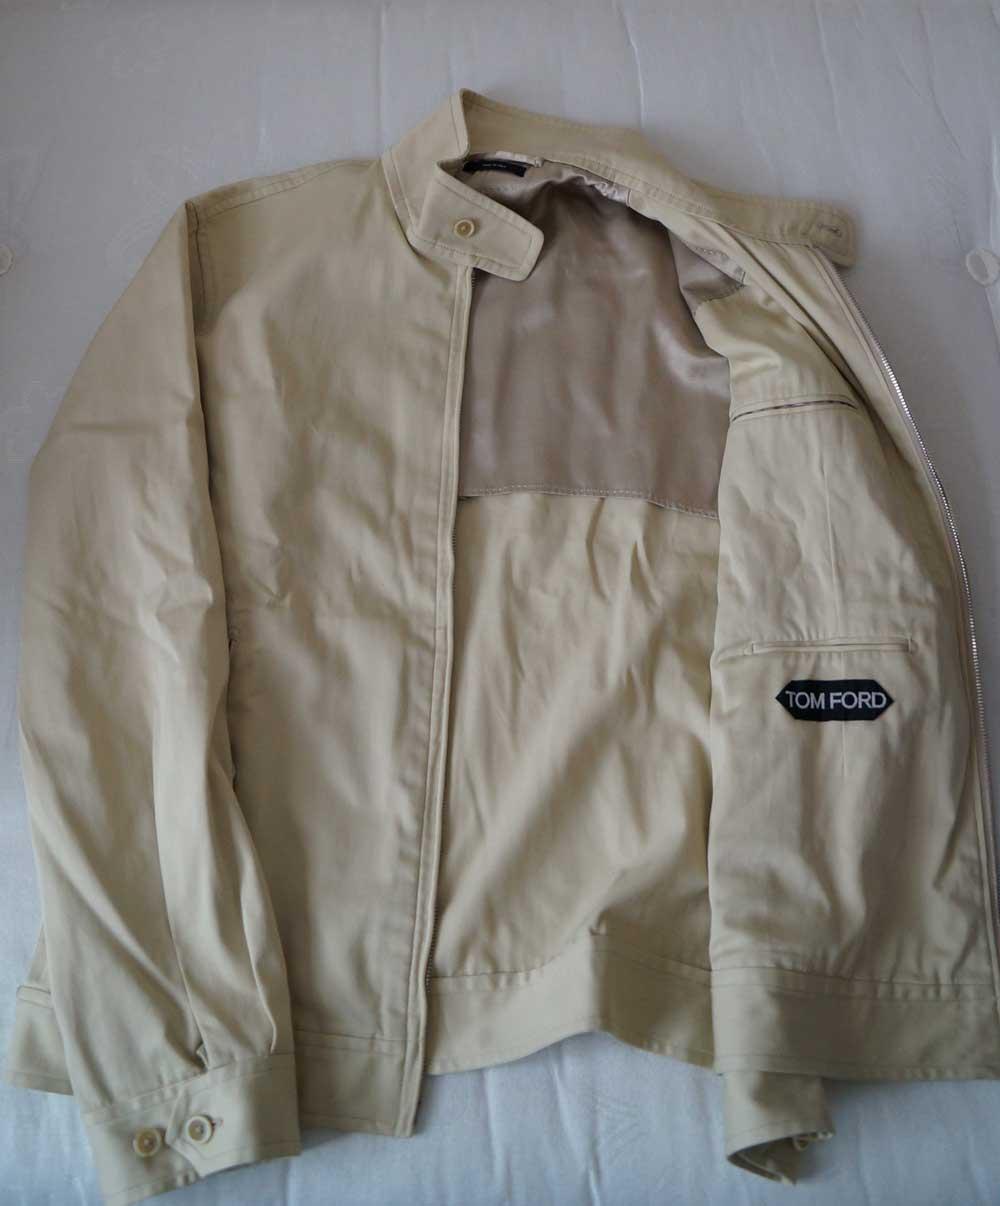 Harrington Jacket in cream flat lay